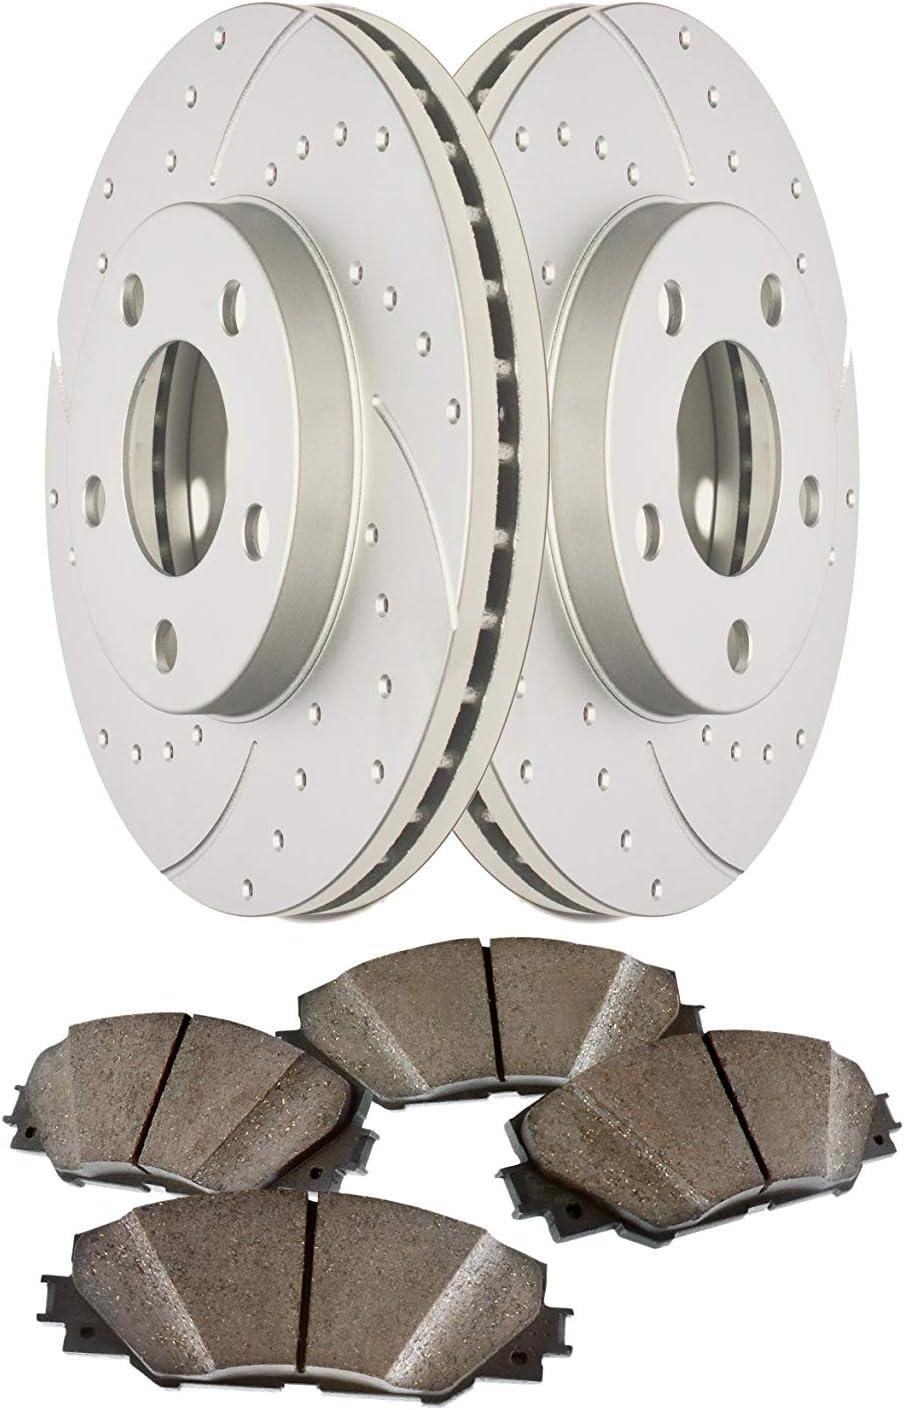 Front Low Max 68% OFF Dust Ceramic Ranking TOP5 Pads and Anti Rust Coated Geomet Premium